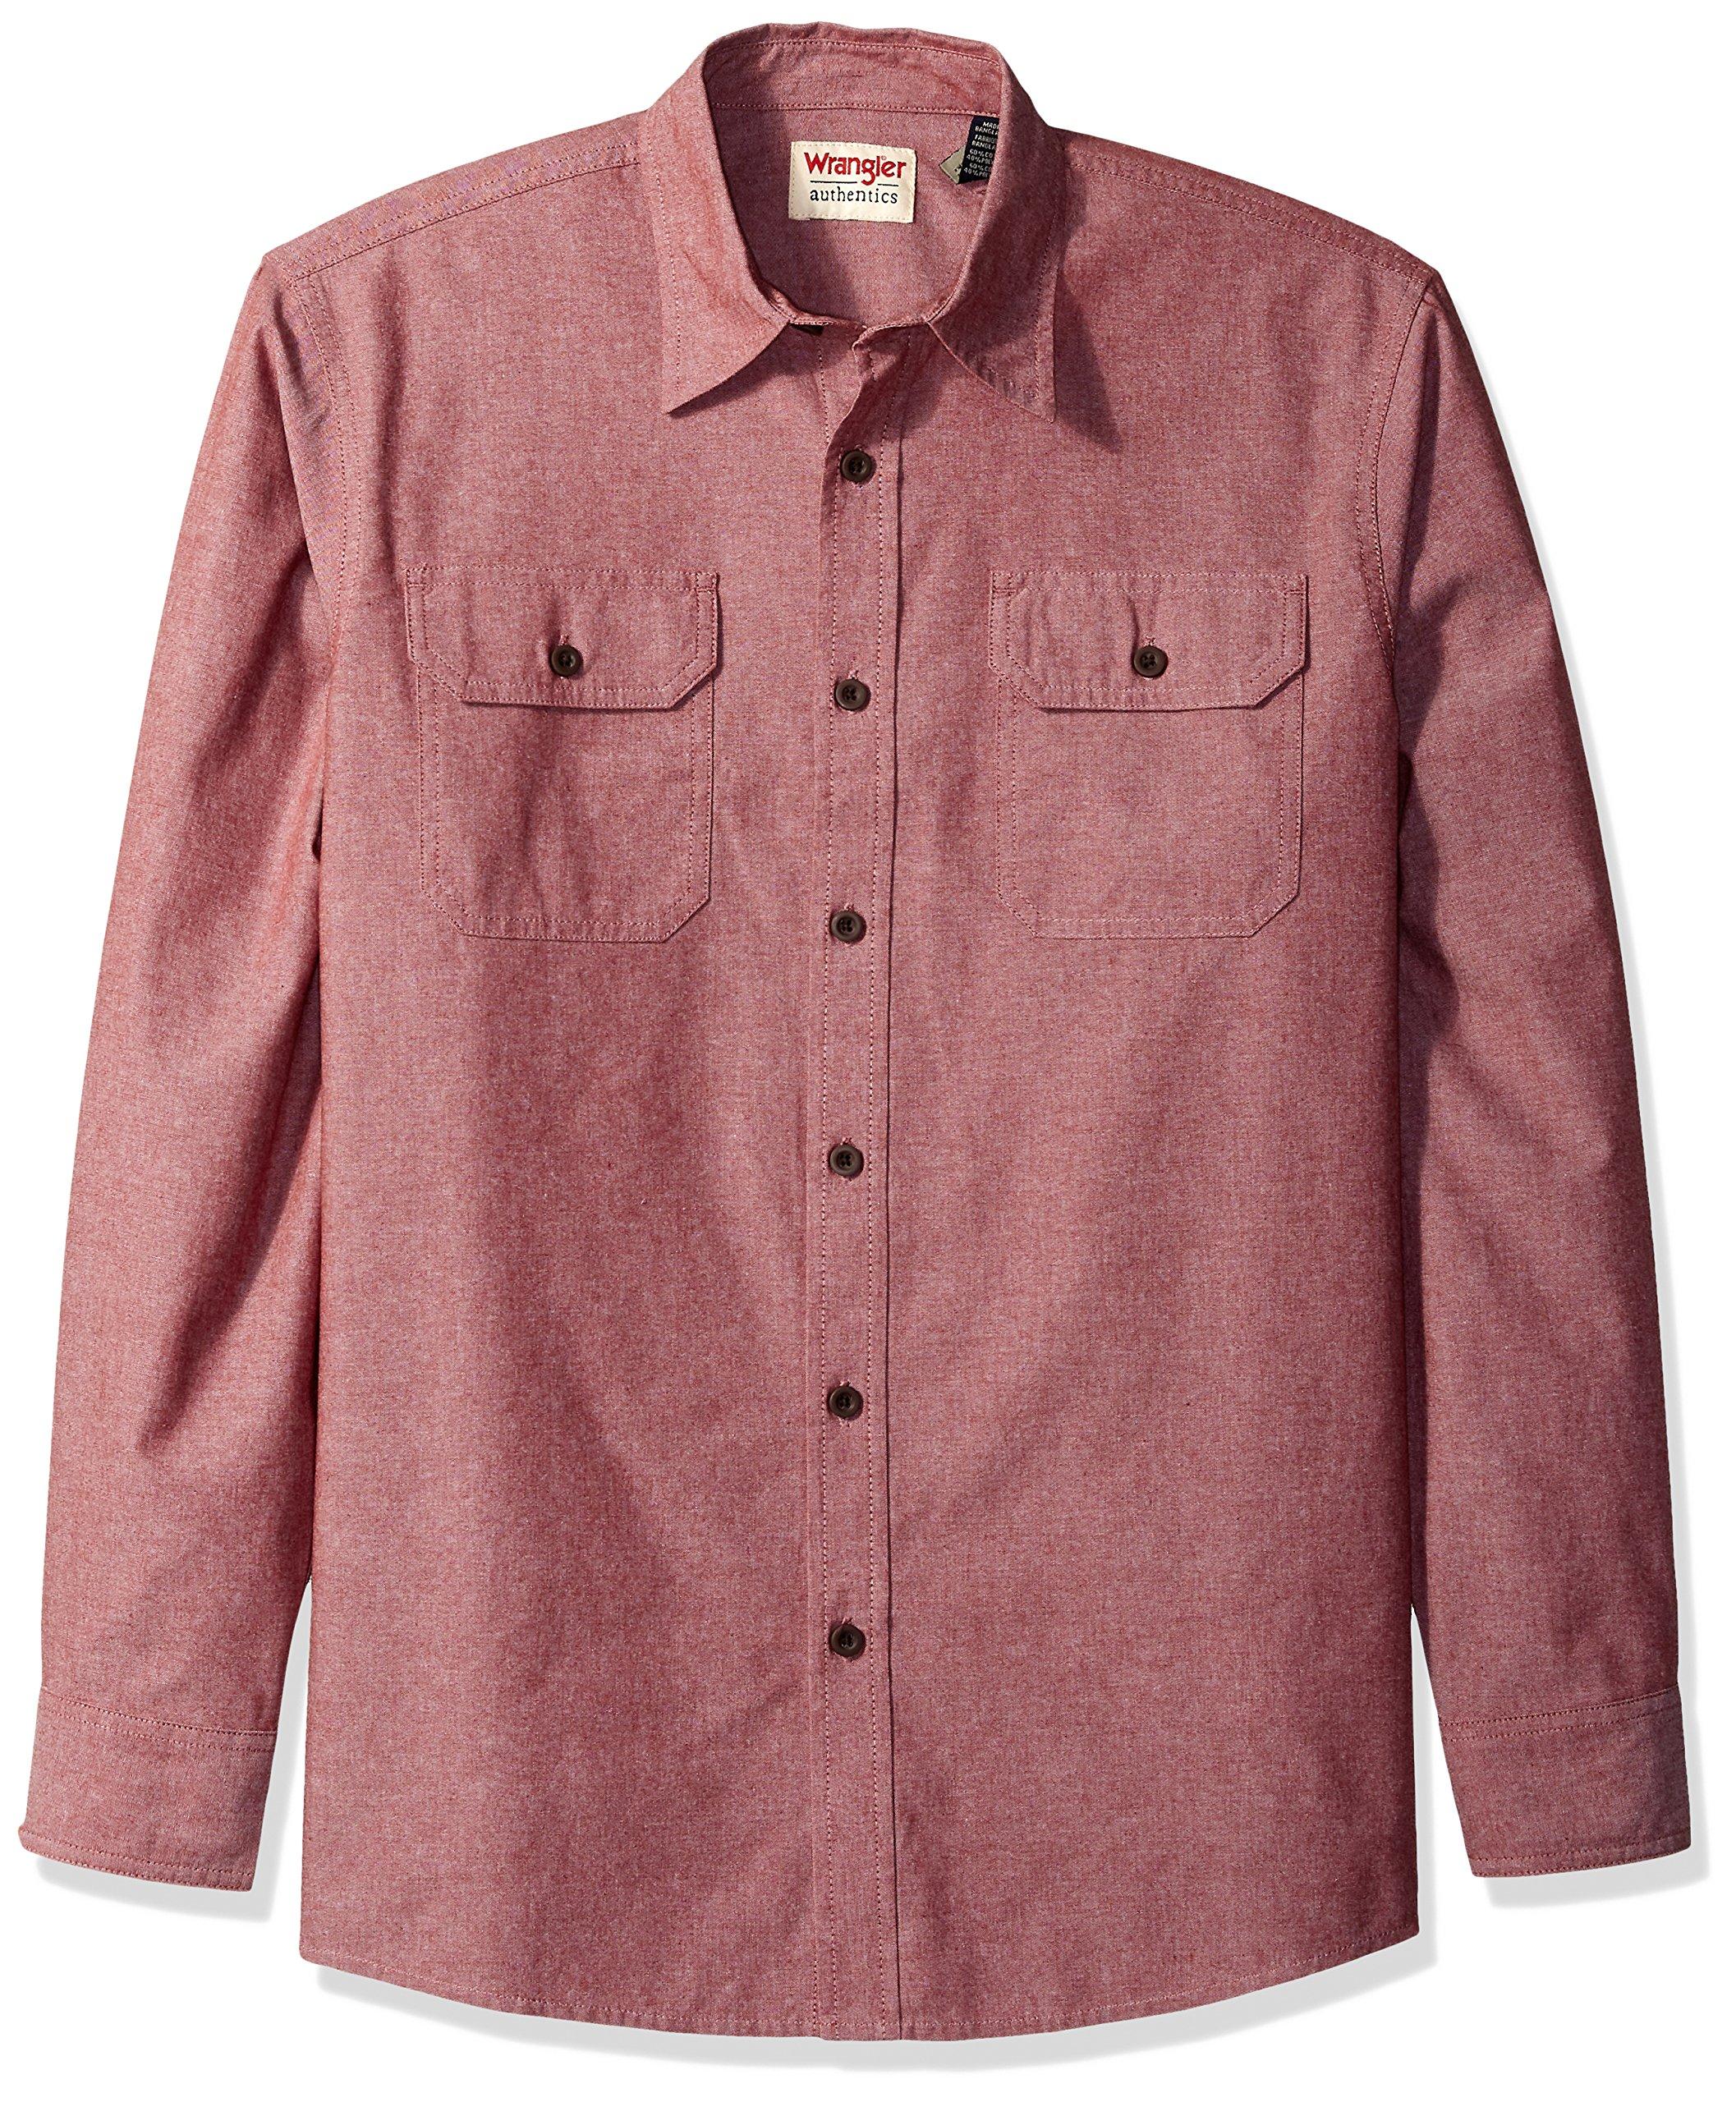 Wrangler Men's Authentics Long Sleeve Classic Woven Shirt, Cowhide Chambray, L